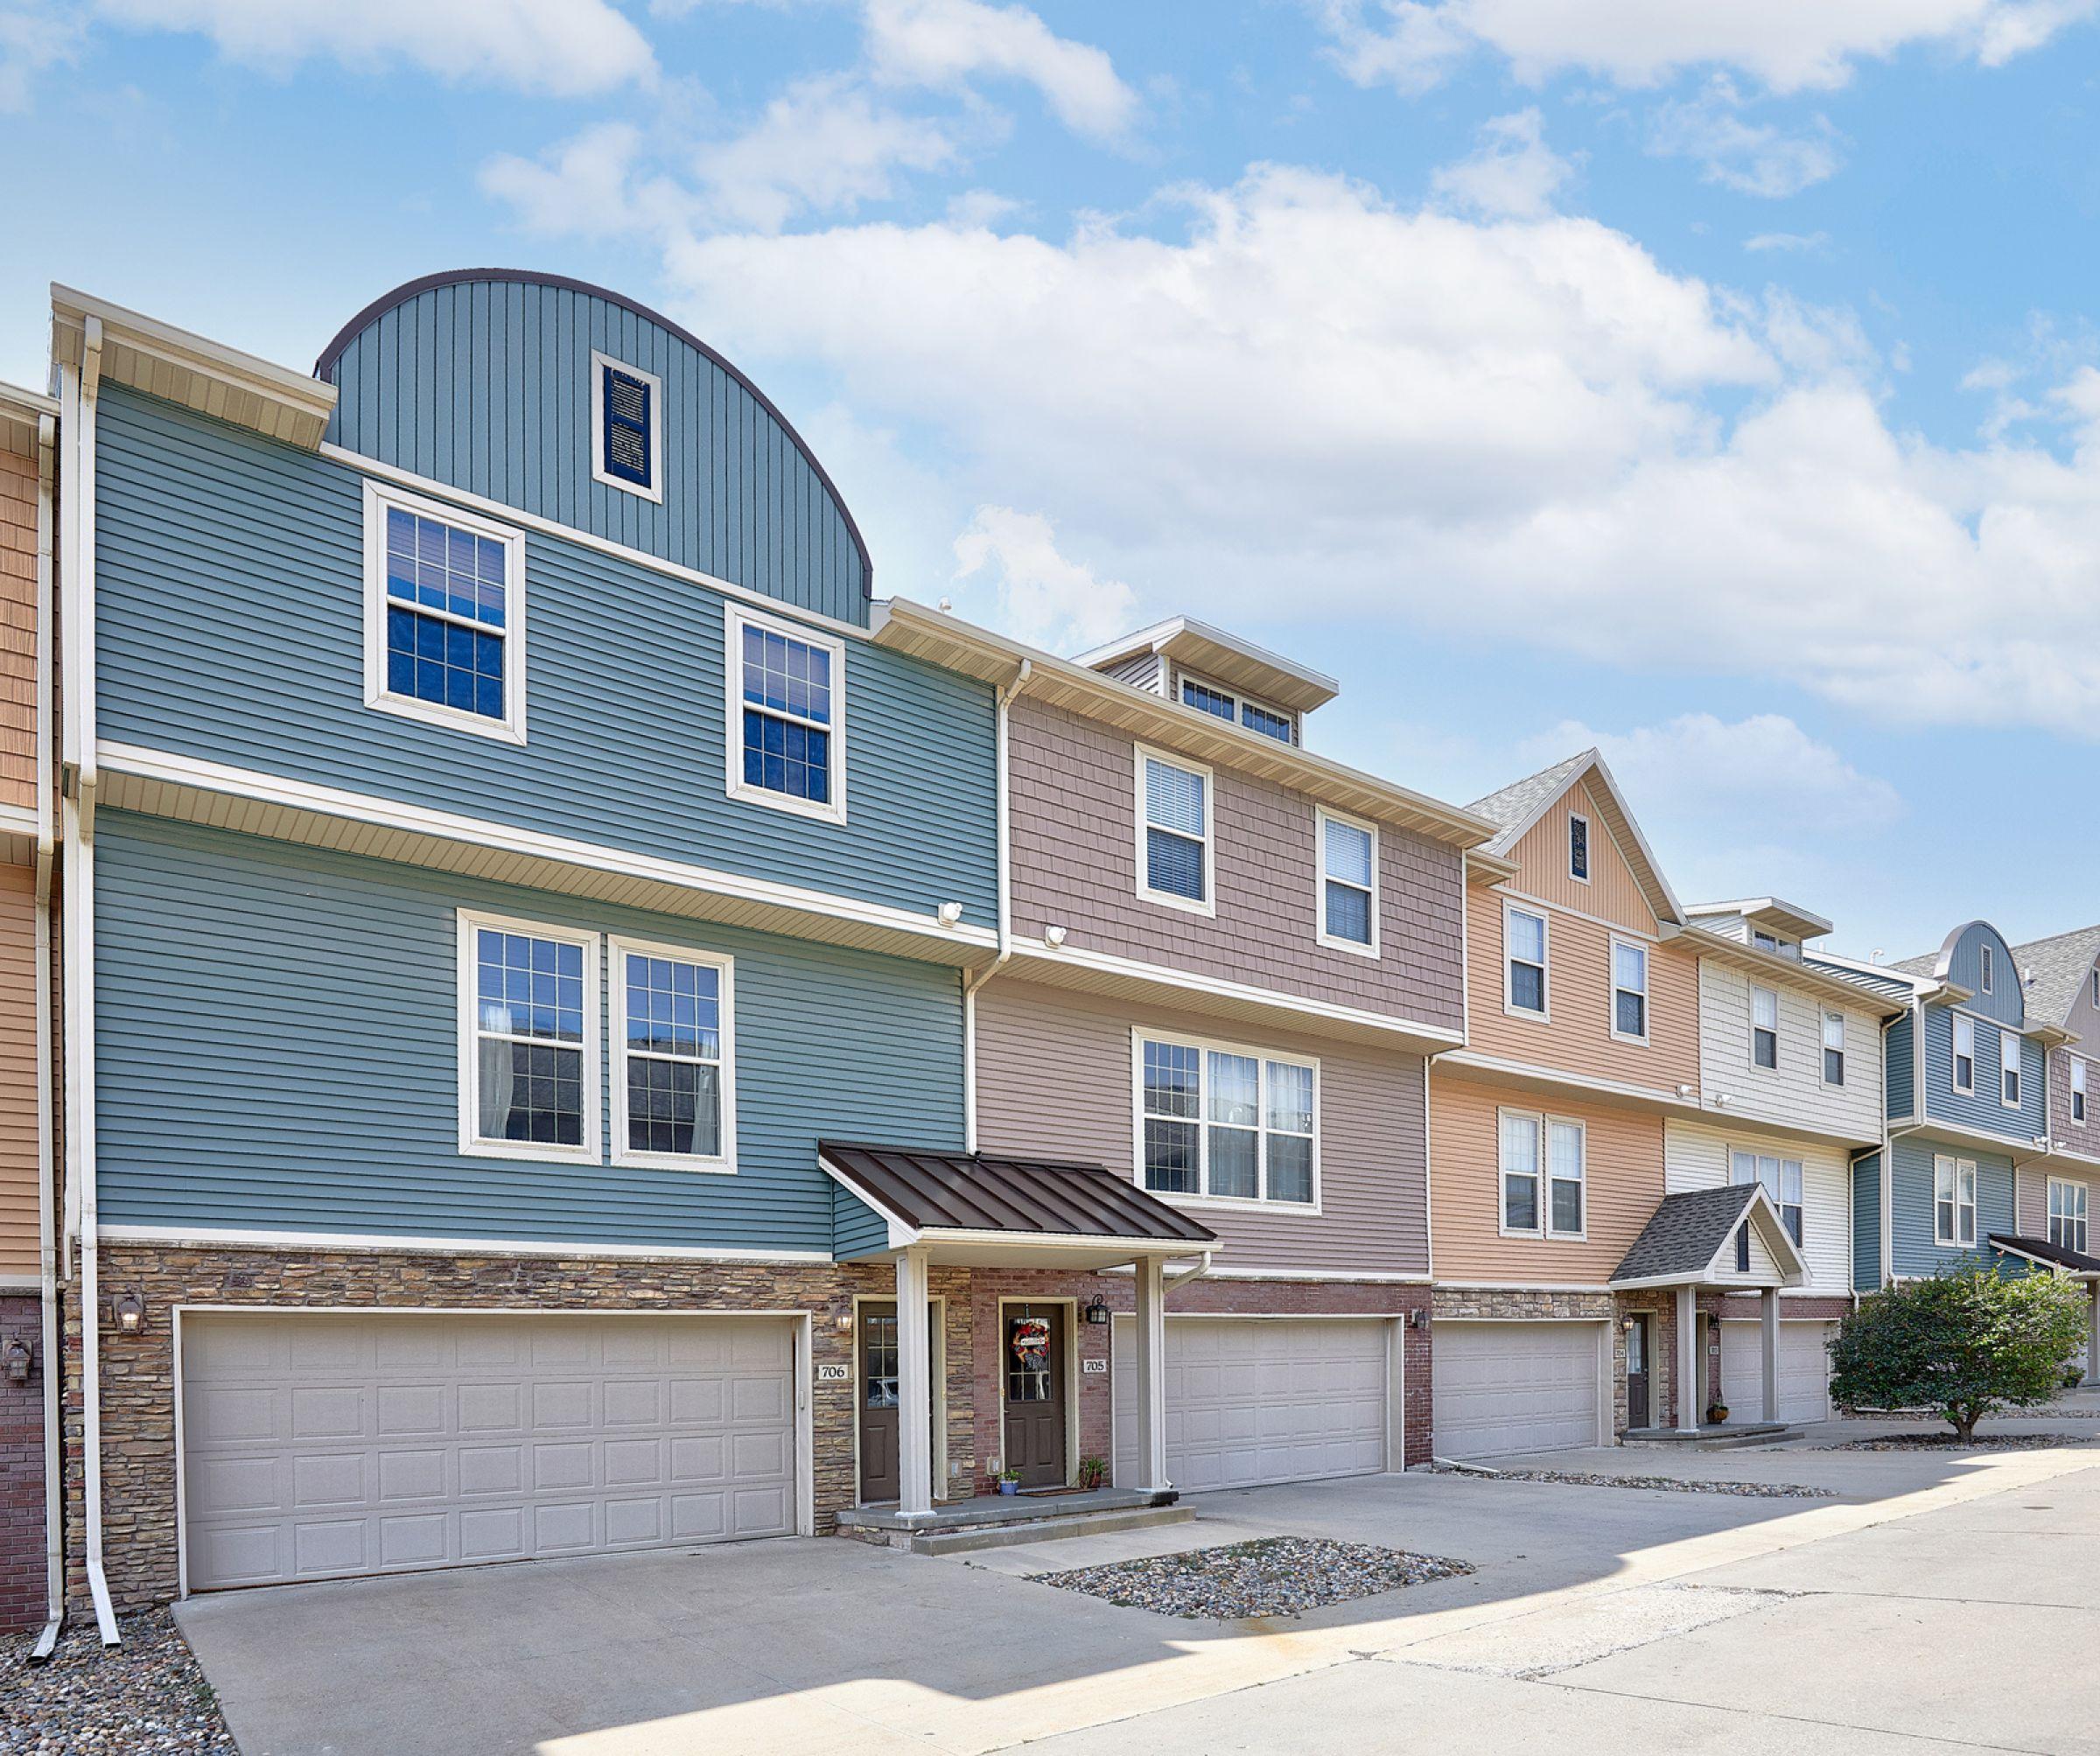 residential-polk-county-iowa-0-acres-listing-number-15662-0-2021-08-03-023301.jpg